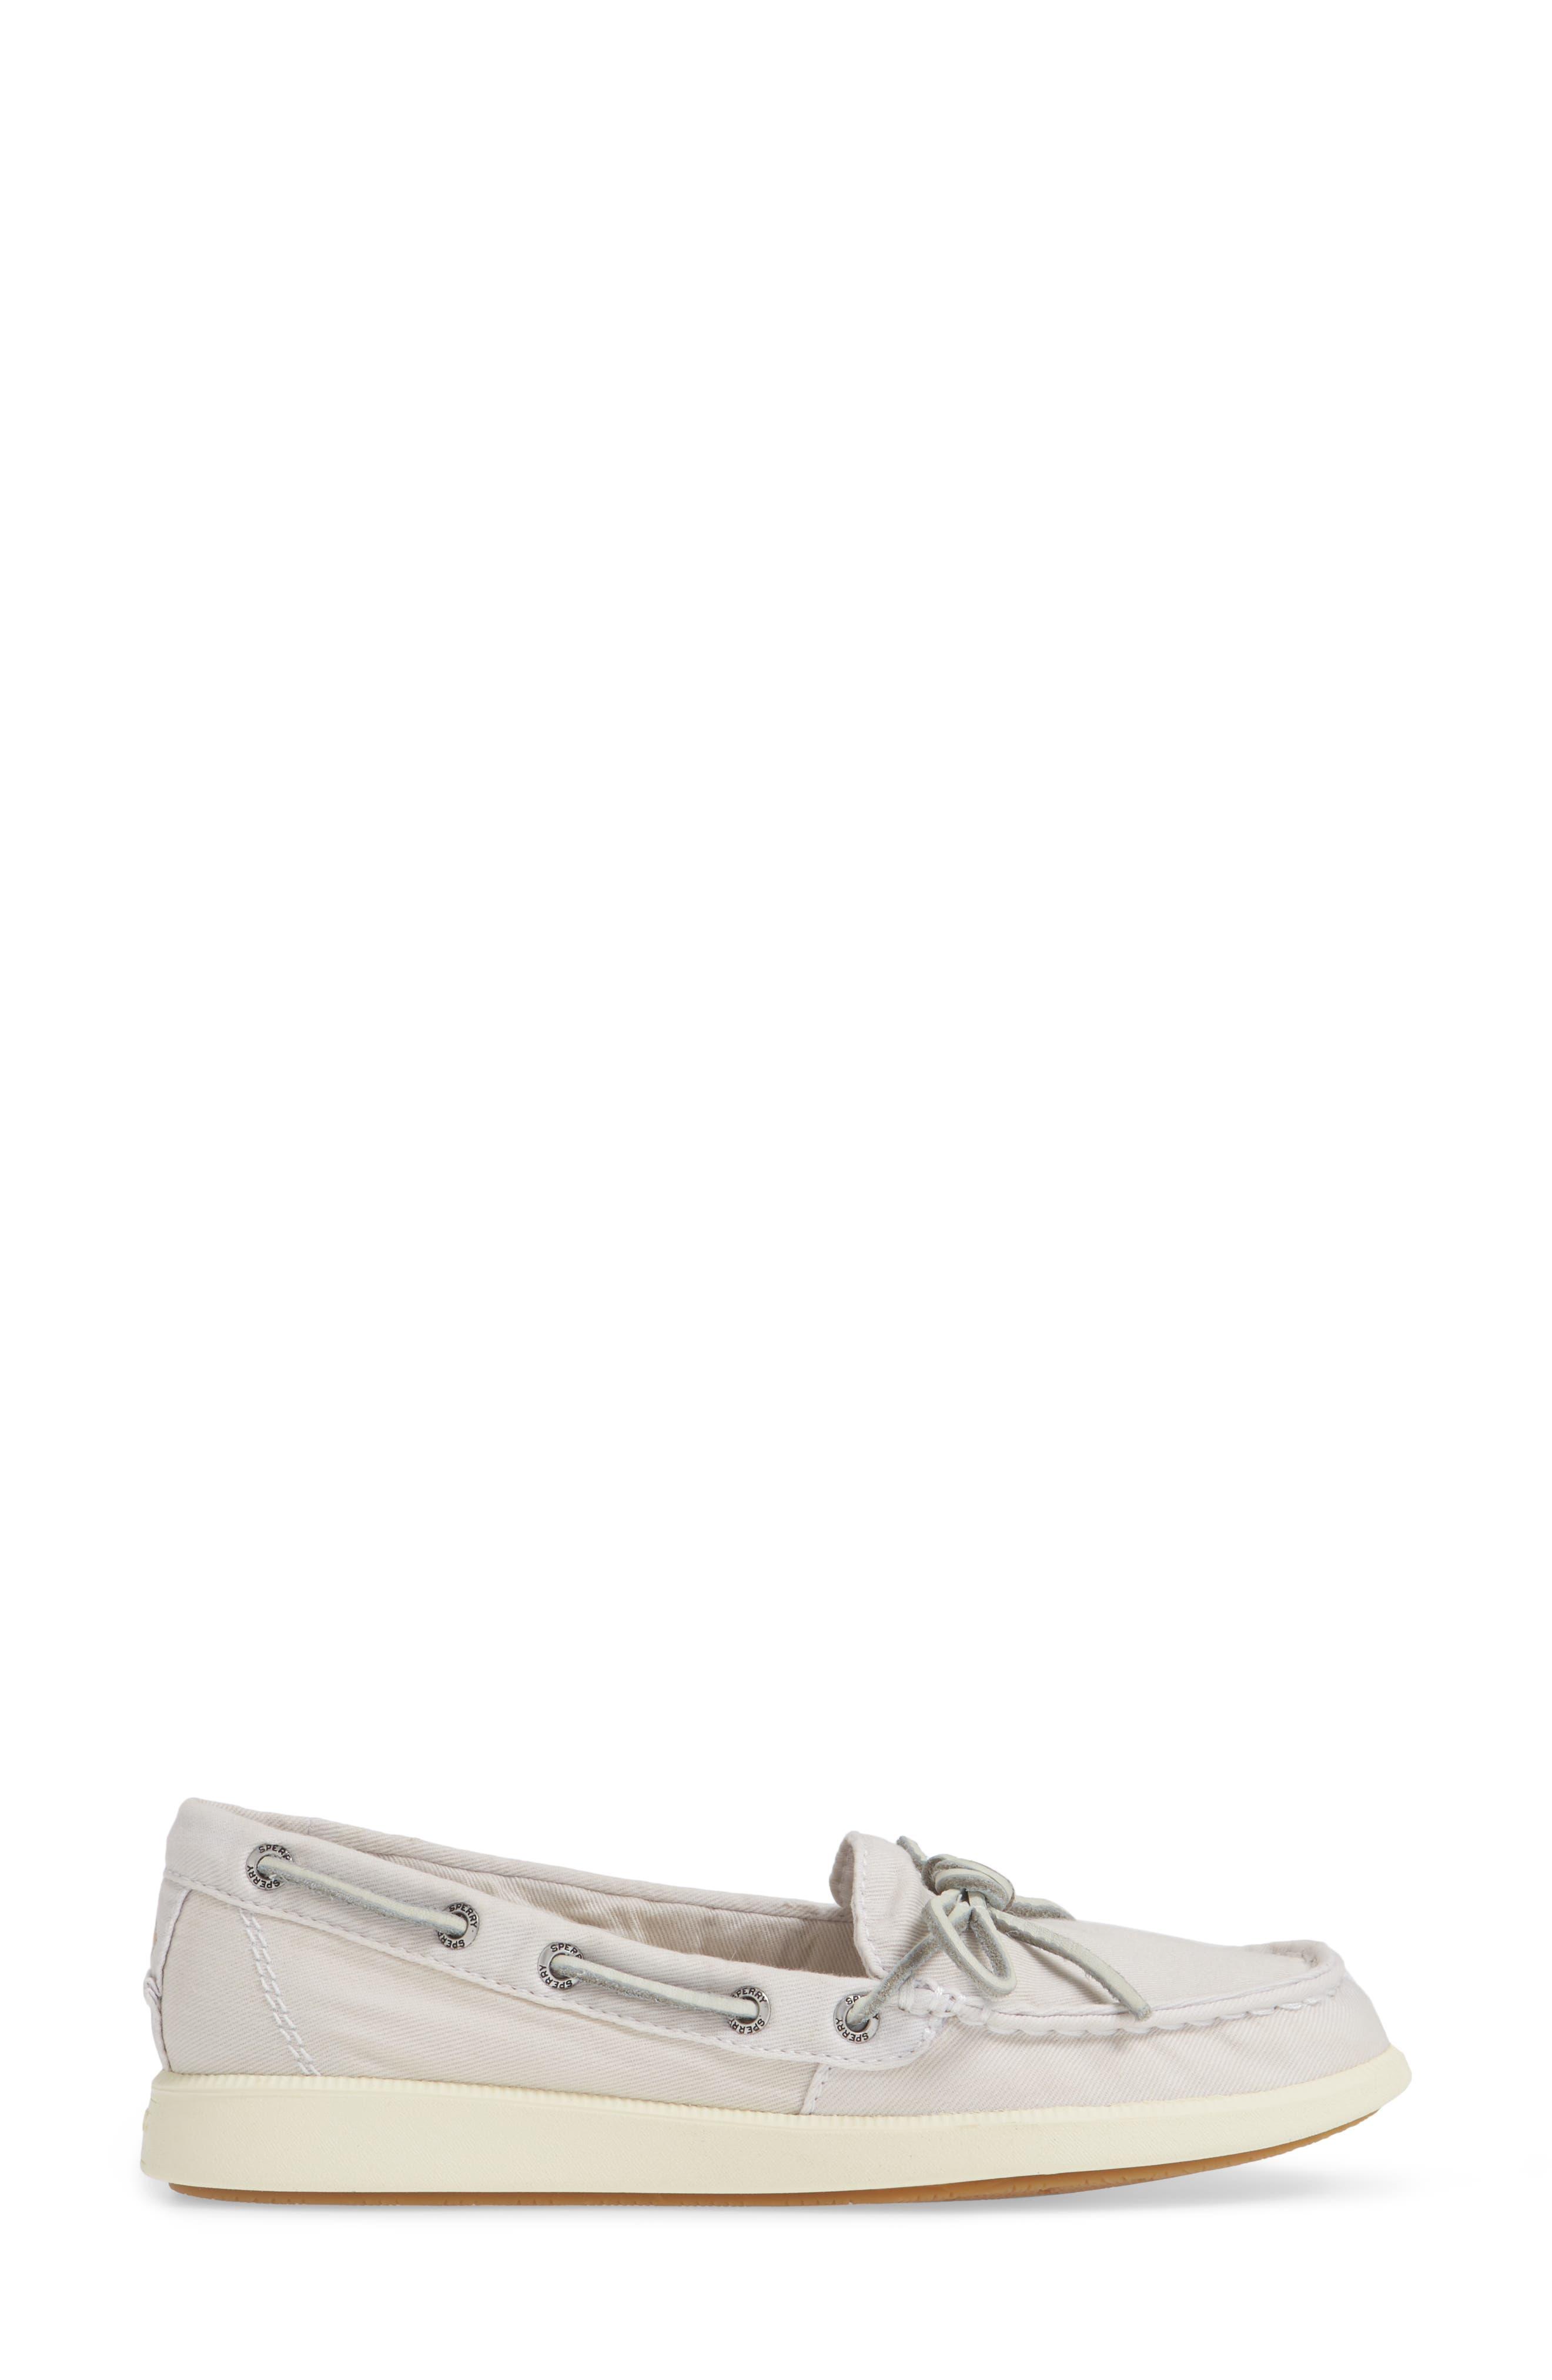 Oasis Boat Shoe,                             Alternate thumbnail 6, color,                             Ivory Canvas